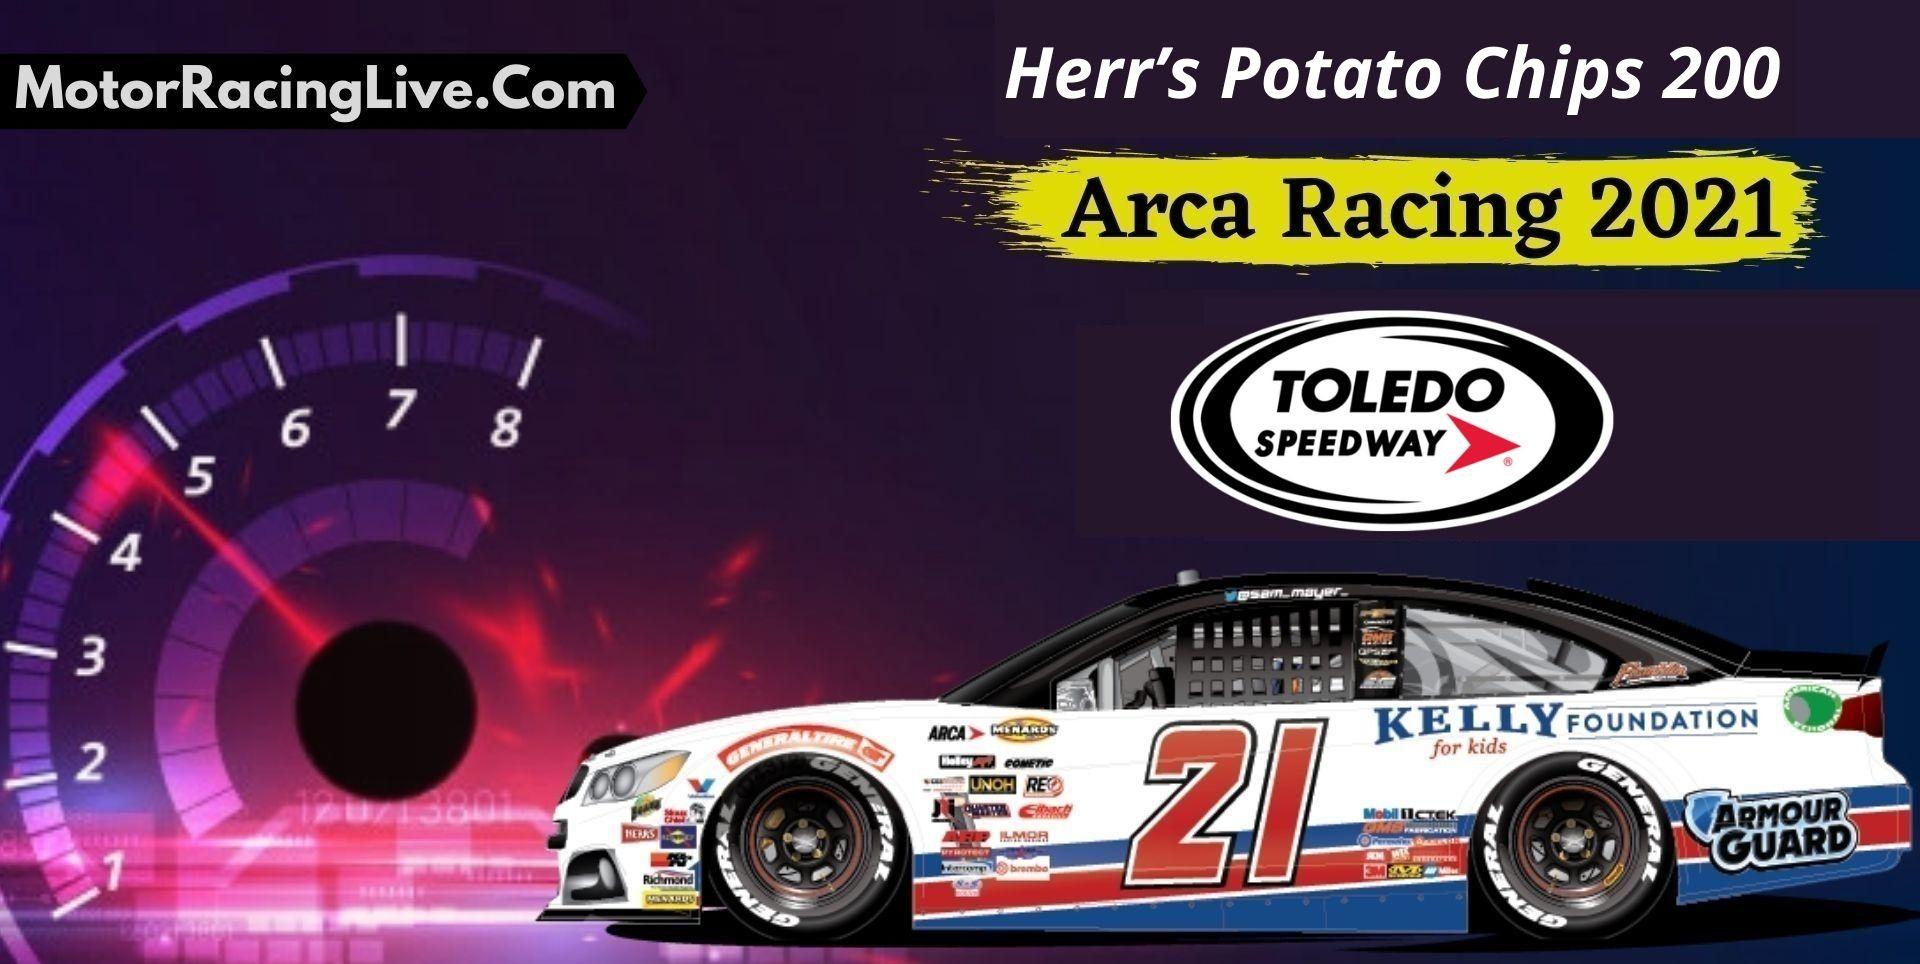 Herr's Potato Chips 200 Live Stream ARCA Racing 2021